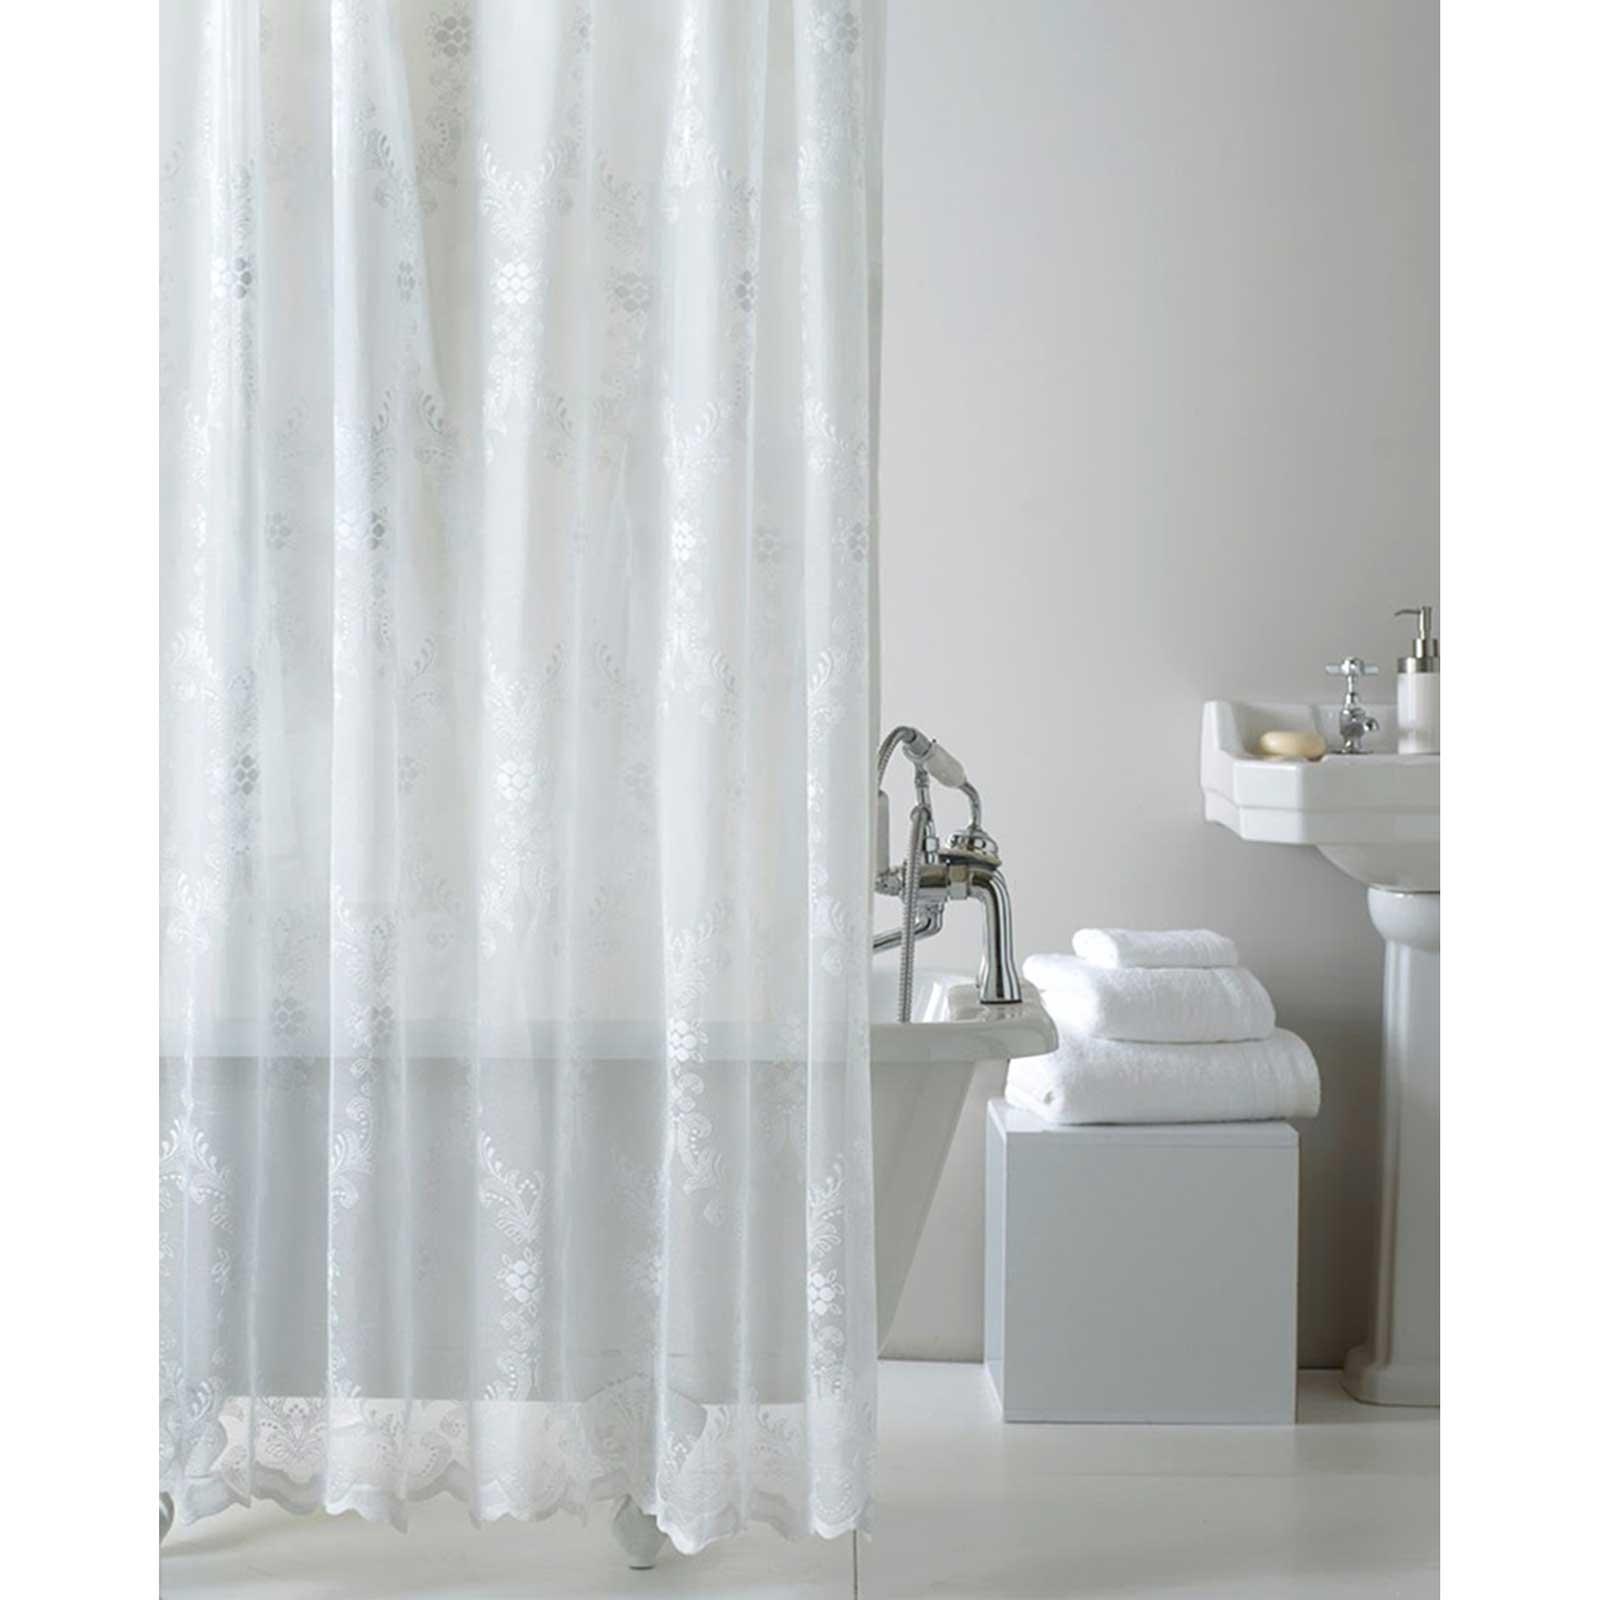 Quality Peva Shower Curtain With Ring Hooks For Bathroom 180 X 180 Cm Long Ebay